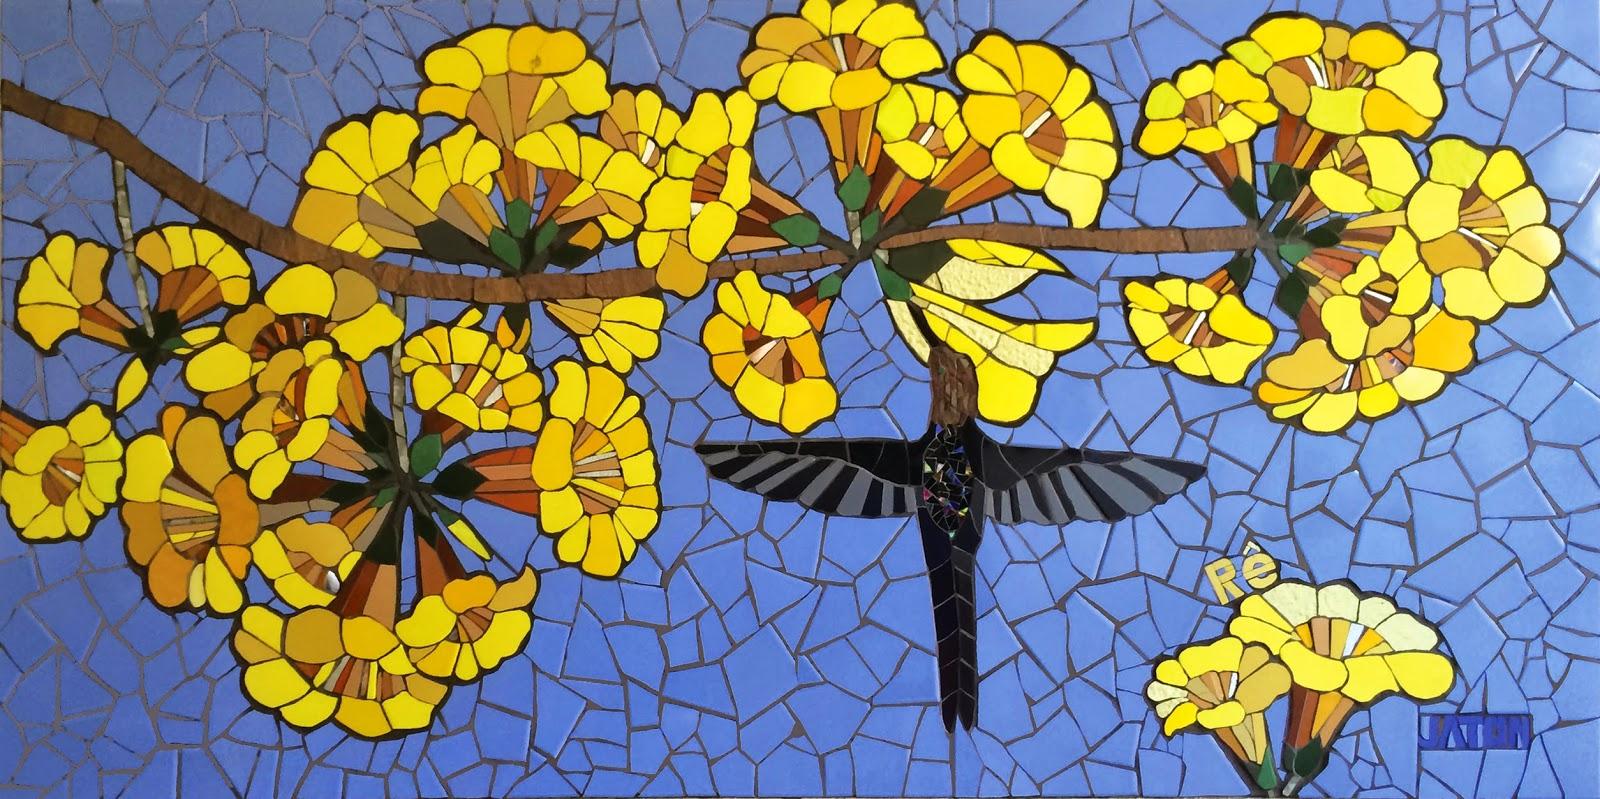 Mosaico creativo de fj mosaic art murales for Murales faciles y creativos